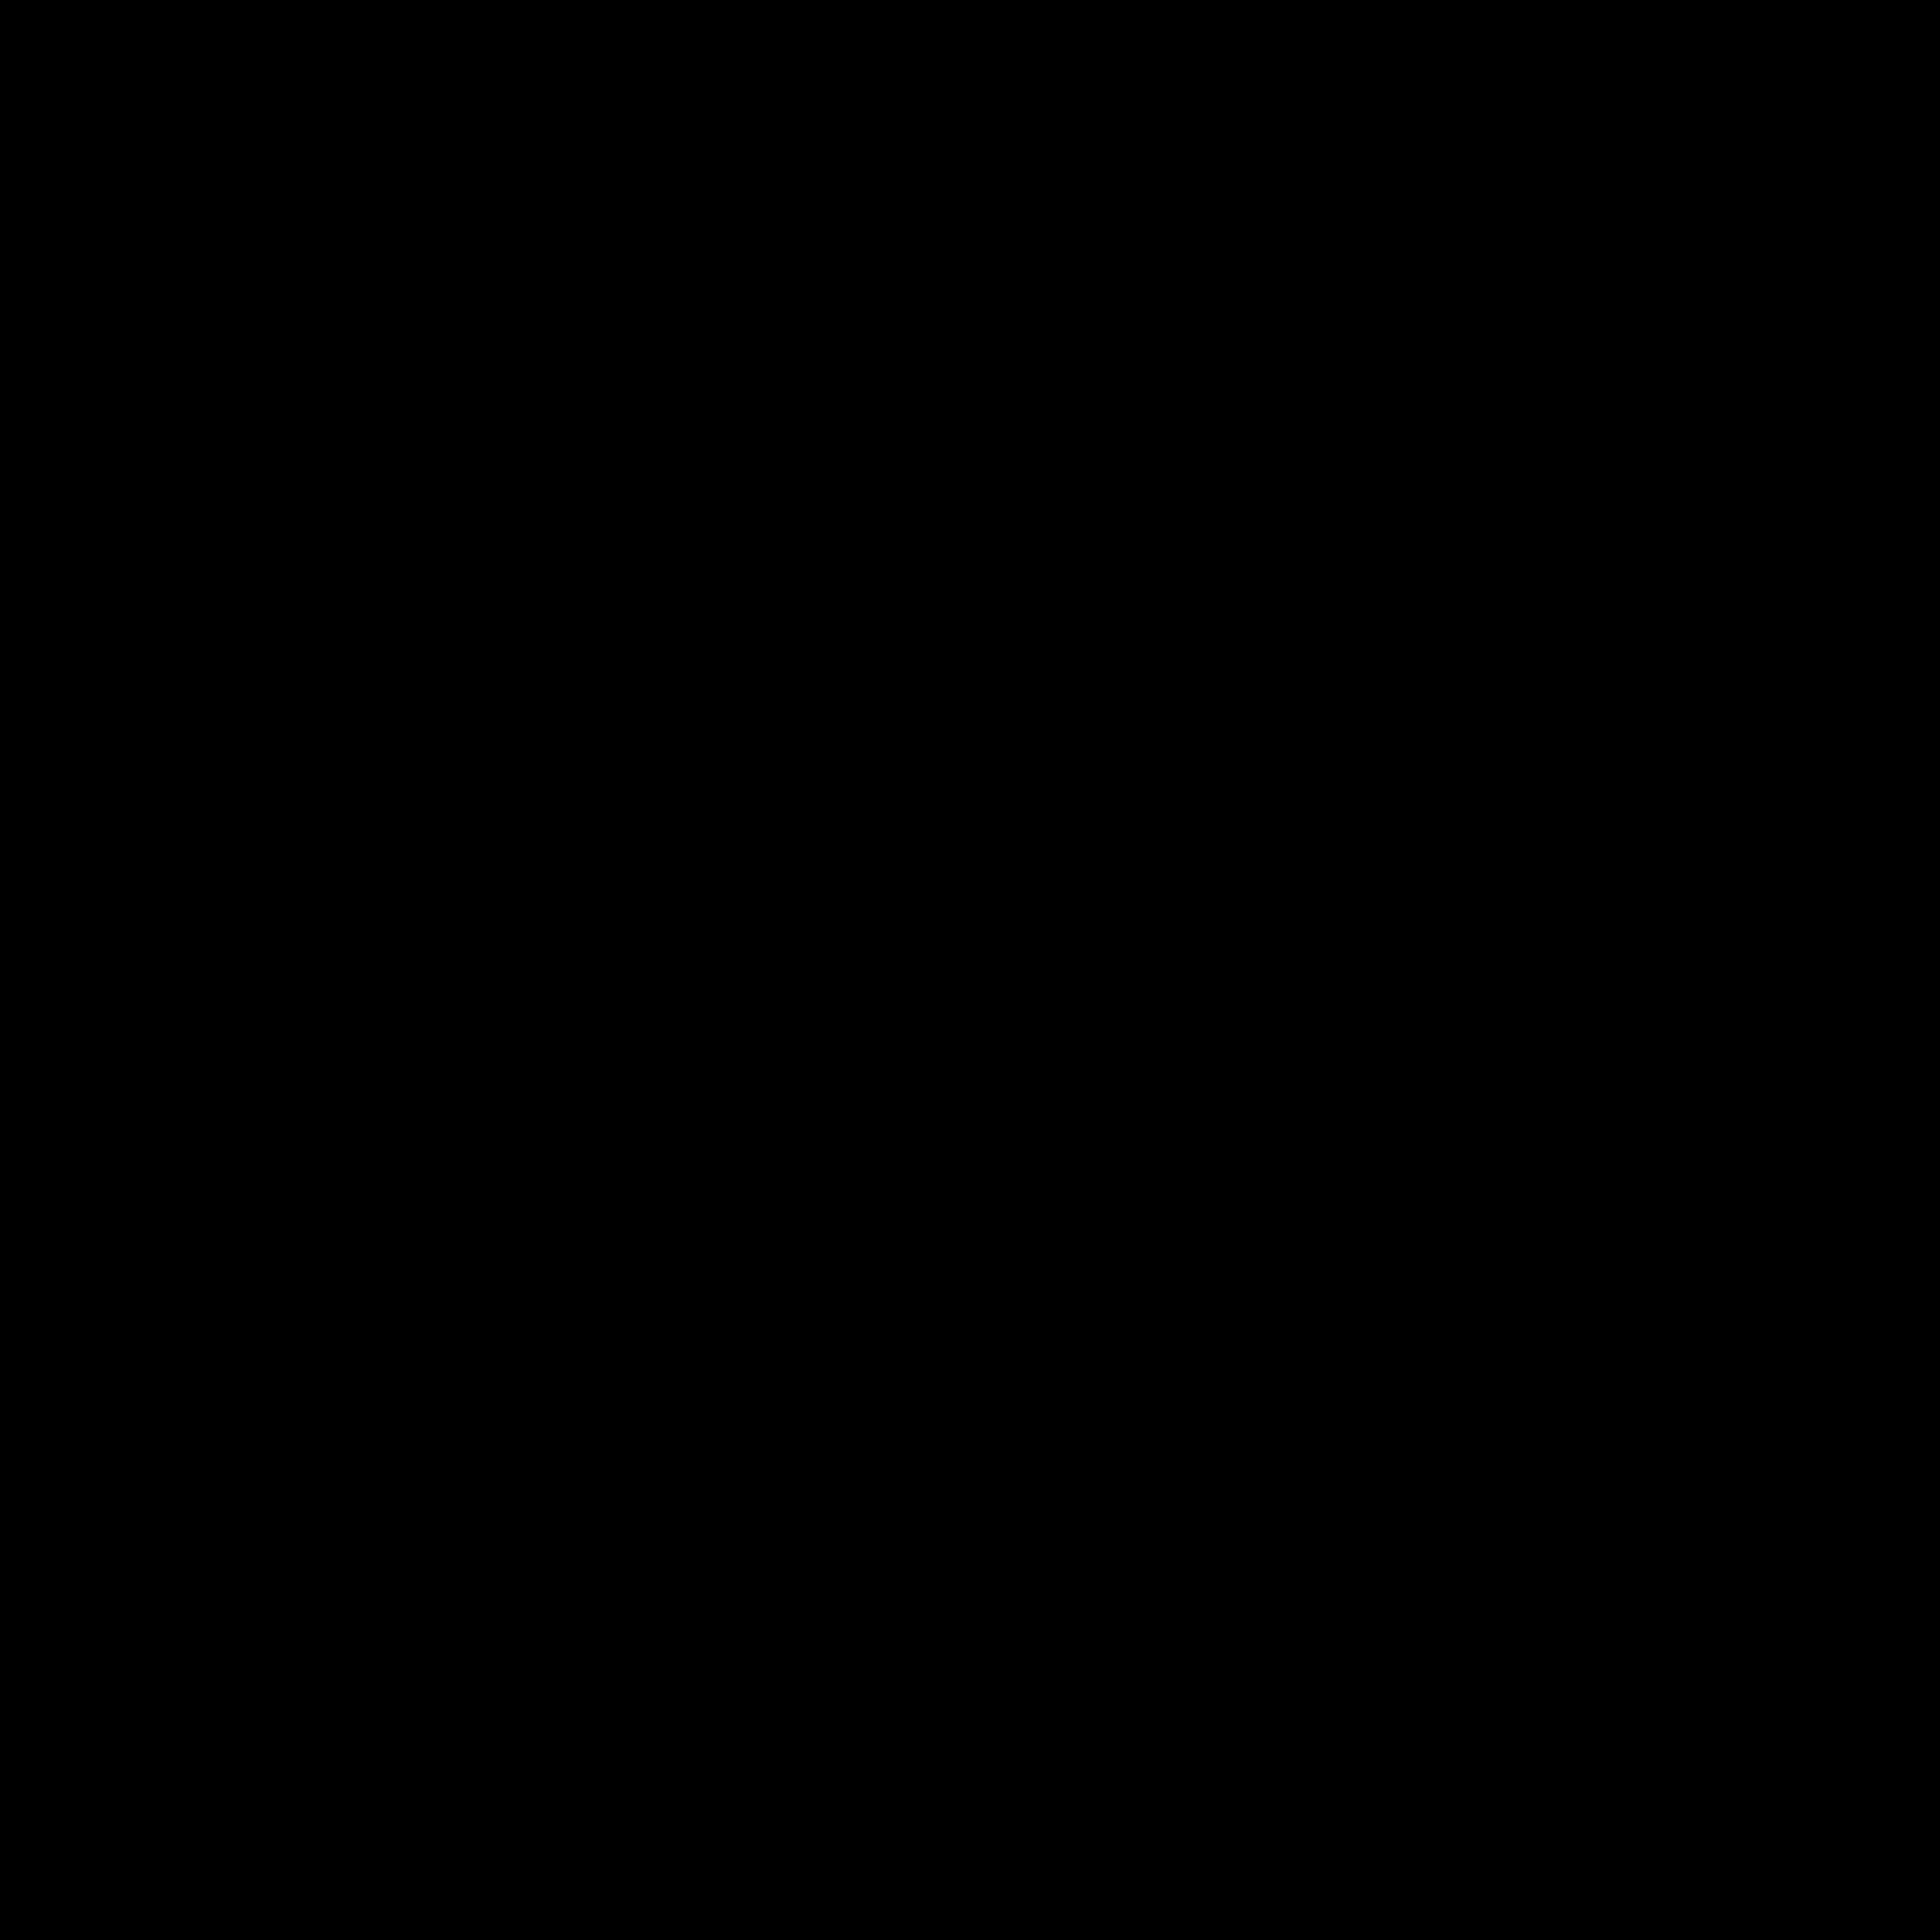 Bosch Logo PNG Transparent & SVG Vector.